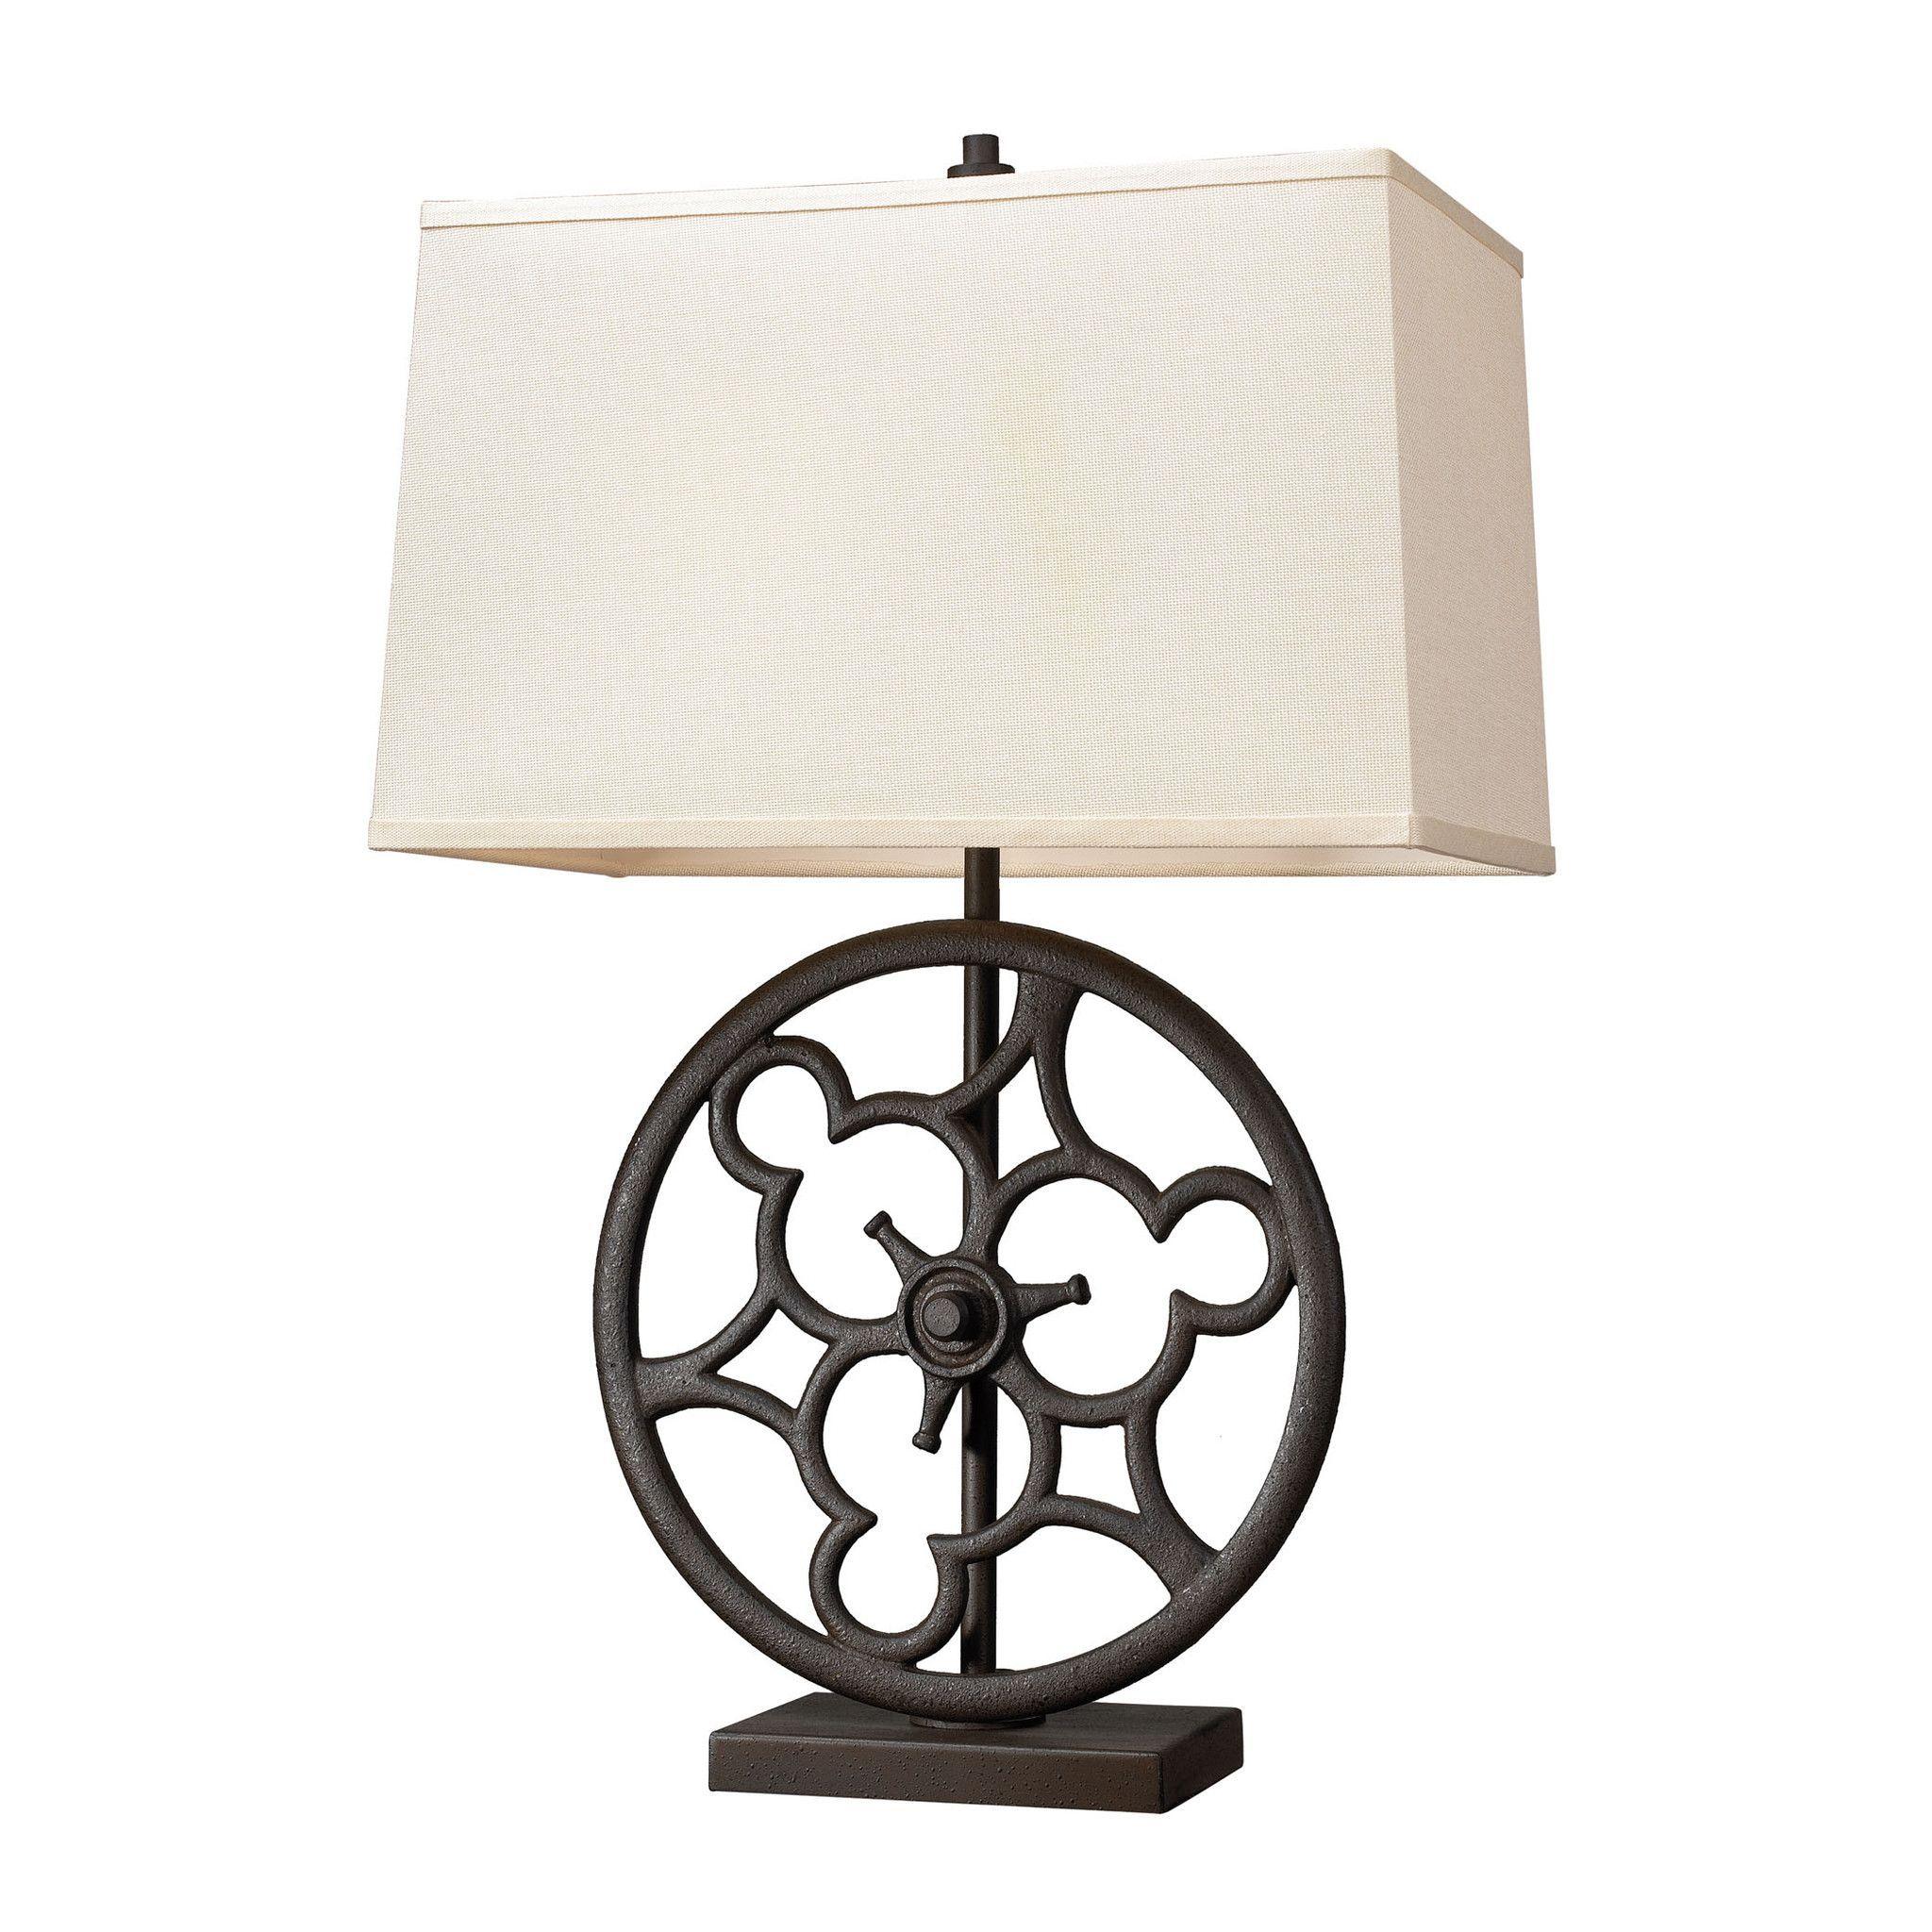 Ironton 2 light table lamp in vintage rust products pinterest ironton 2 light table lamp in vintage rust aloadofball Images